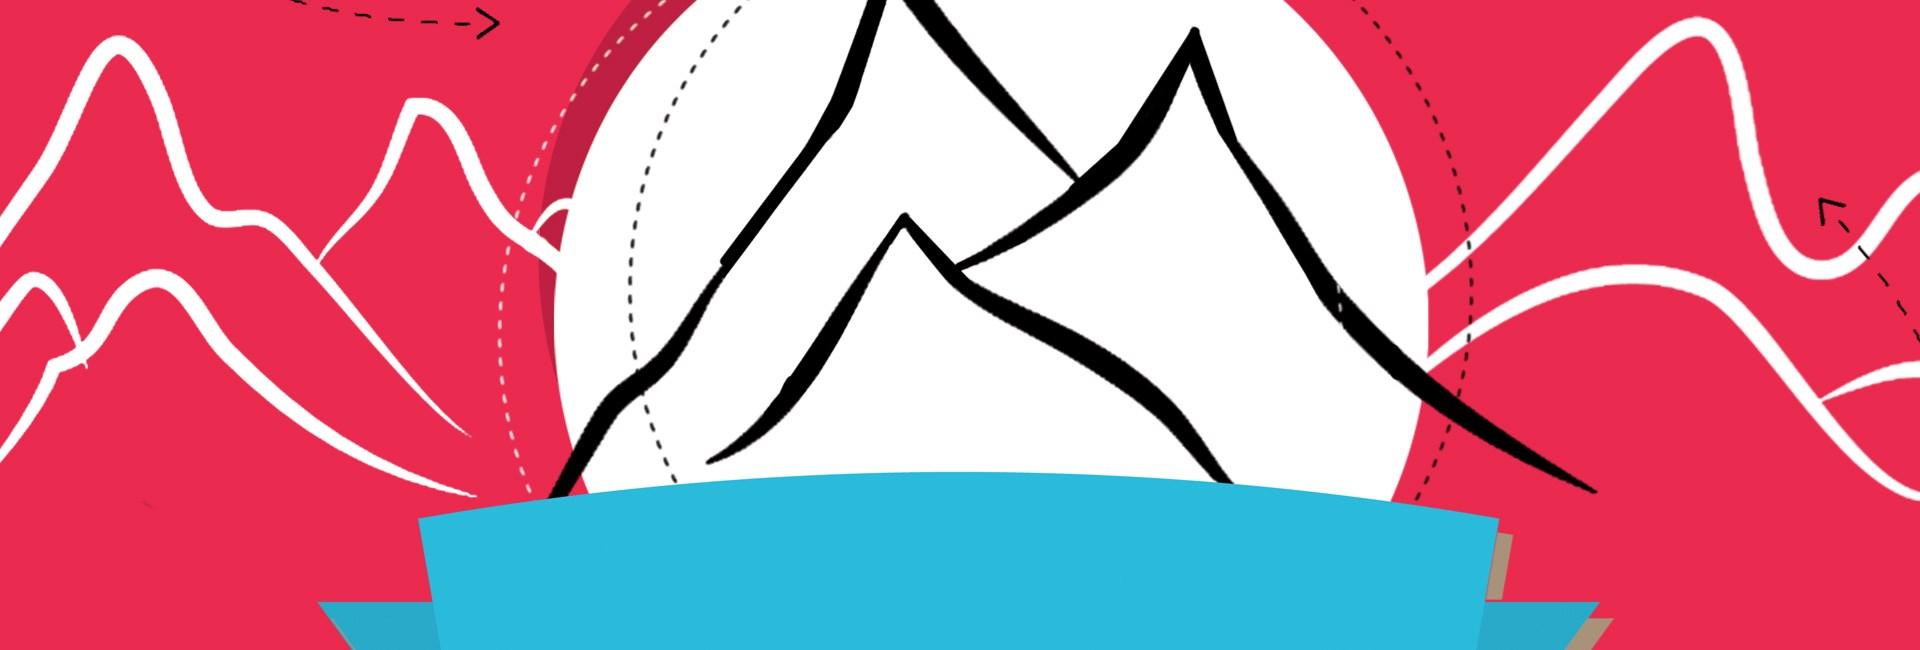 Three Peaks clipart #5, Download drawings